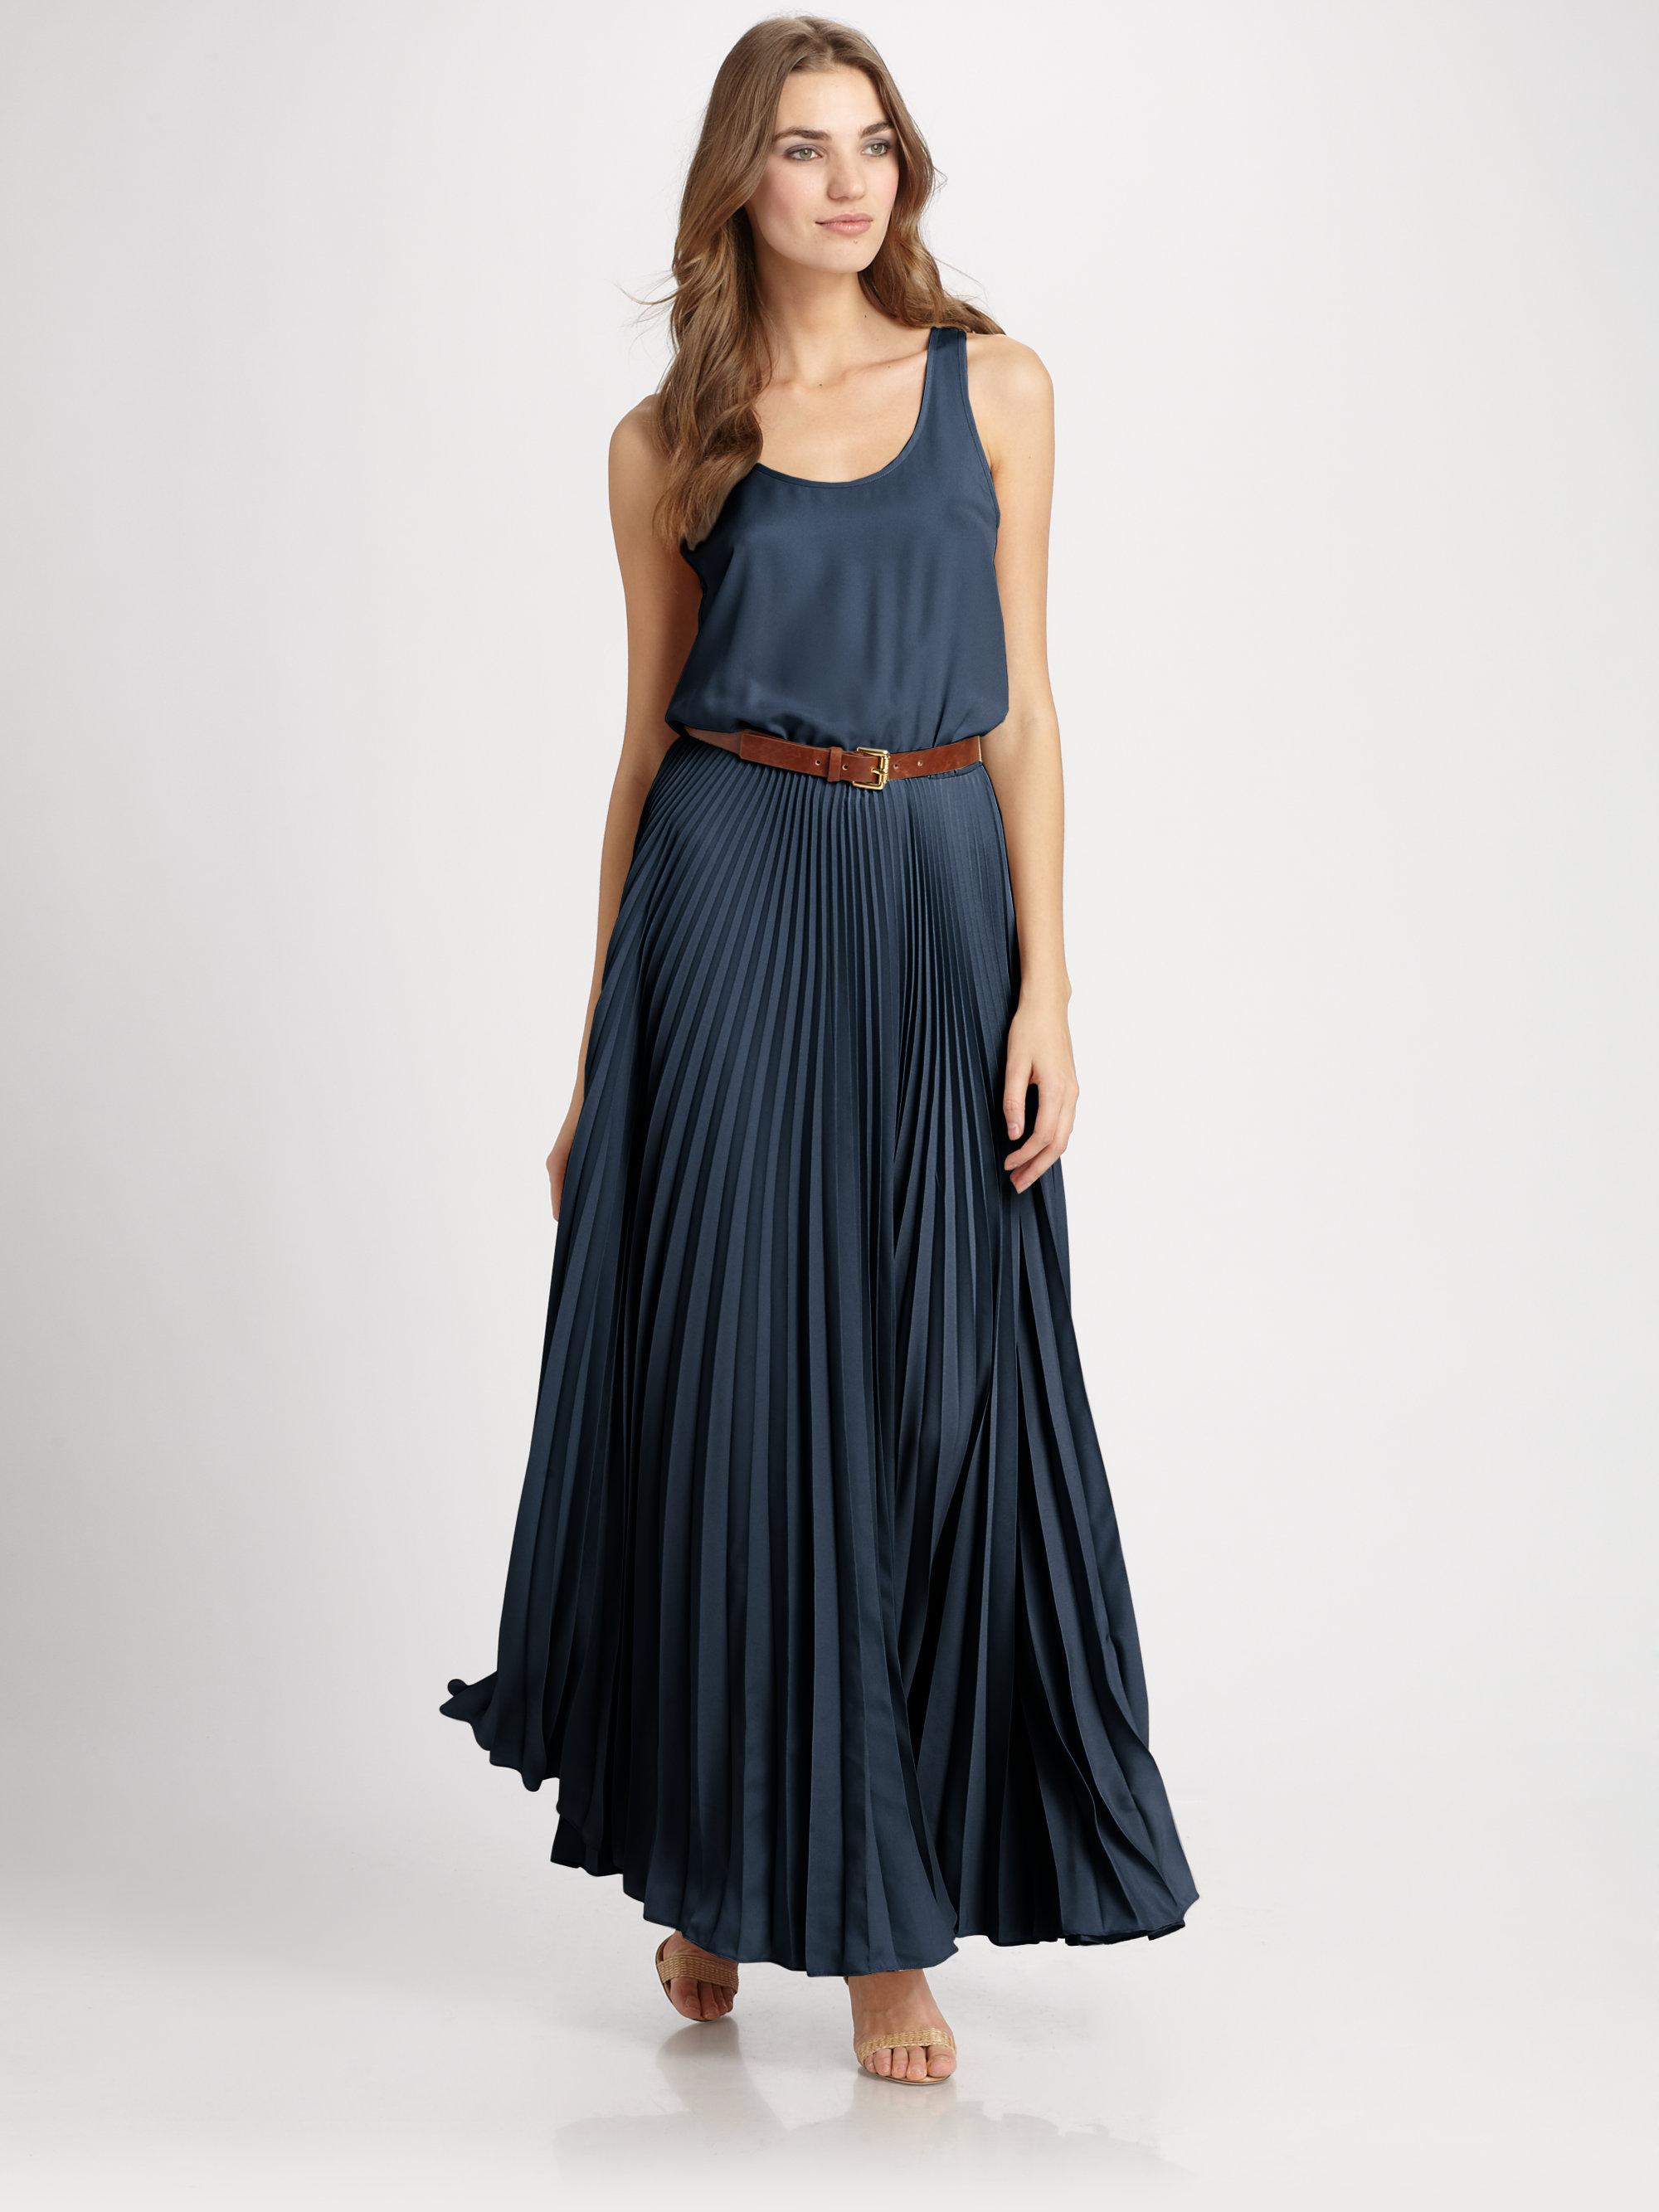 e714f9dd9 Michael Kors Maxi Dresses - Dress Foto and Picture